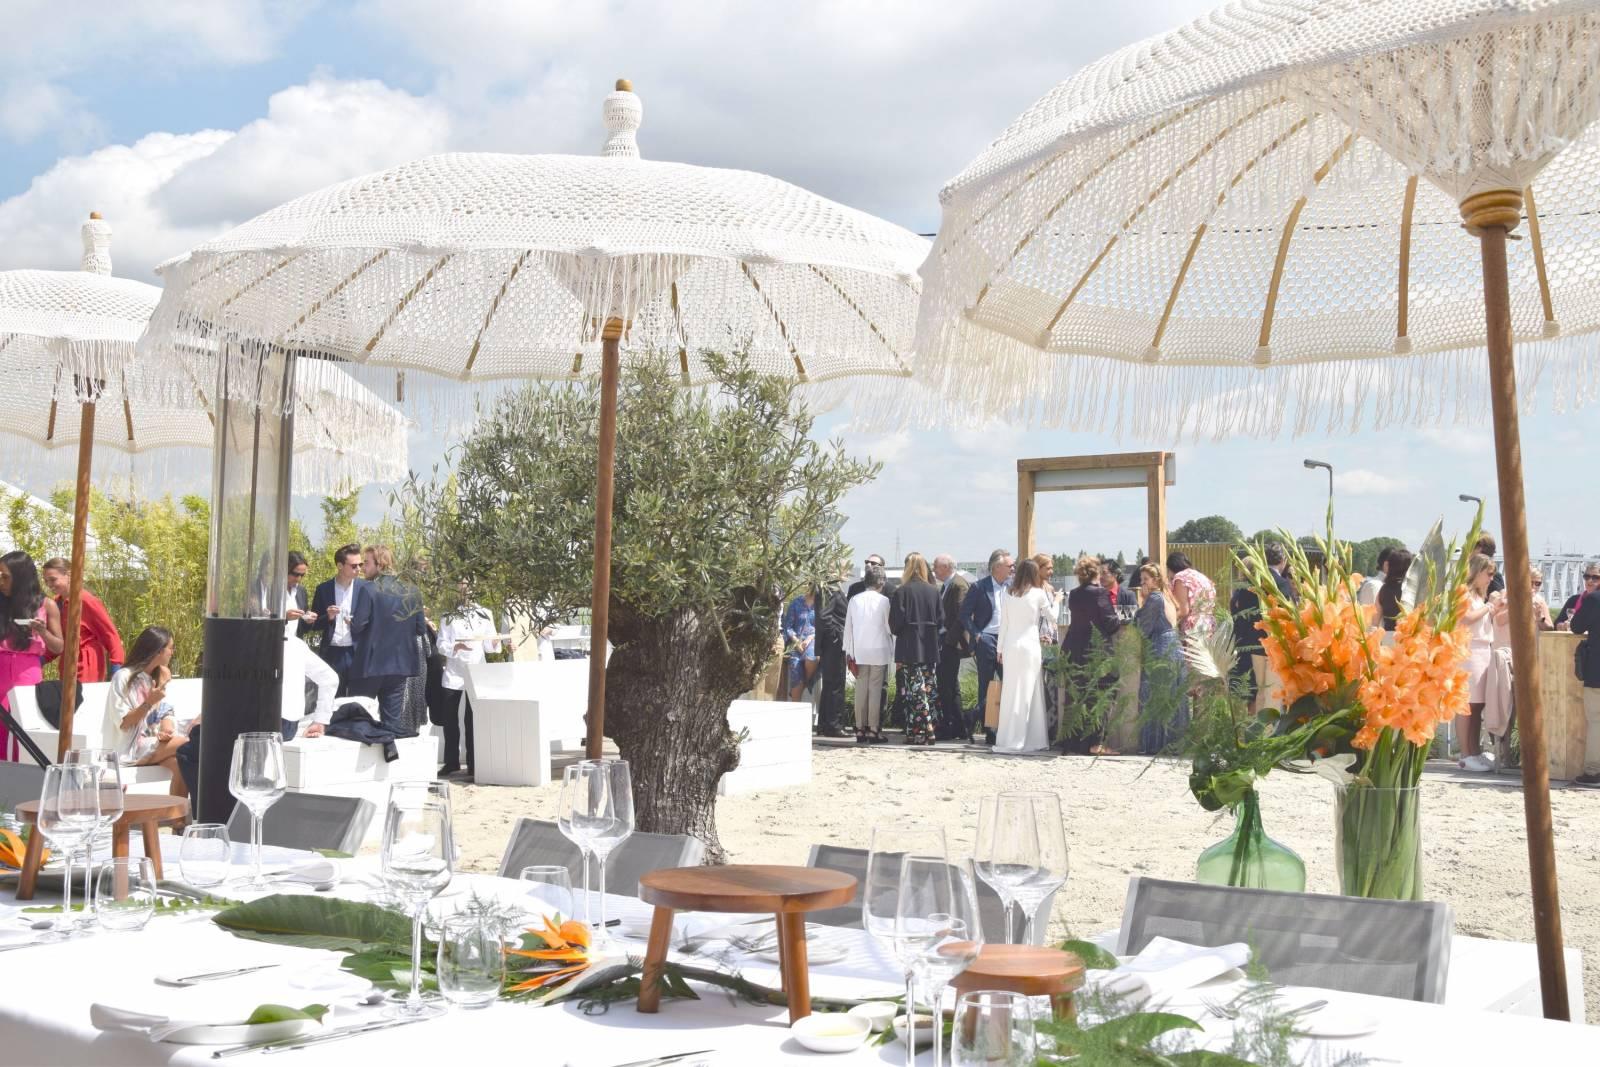 Strantwerpen - Feestzaal - Trouwzaal - Trouwen op het Strand - House of Weddings - 34